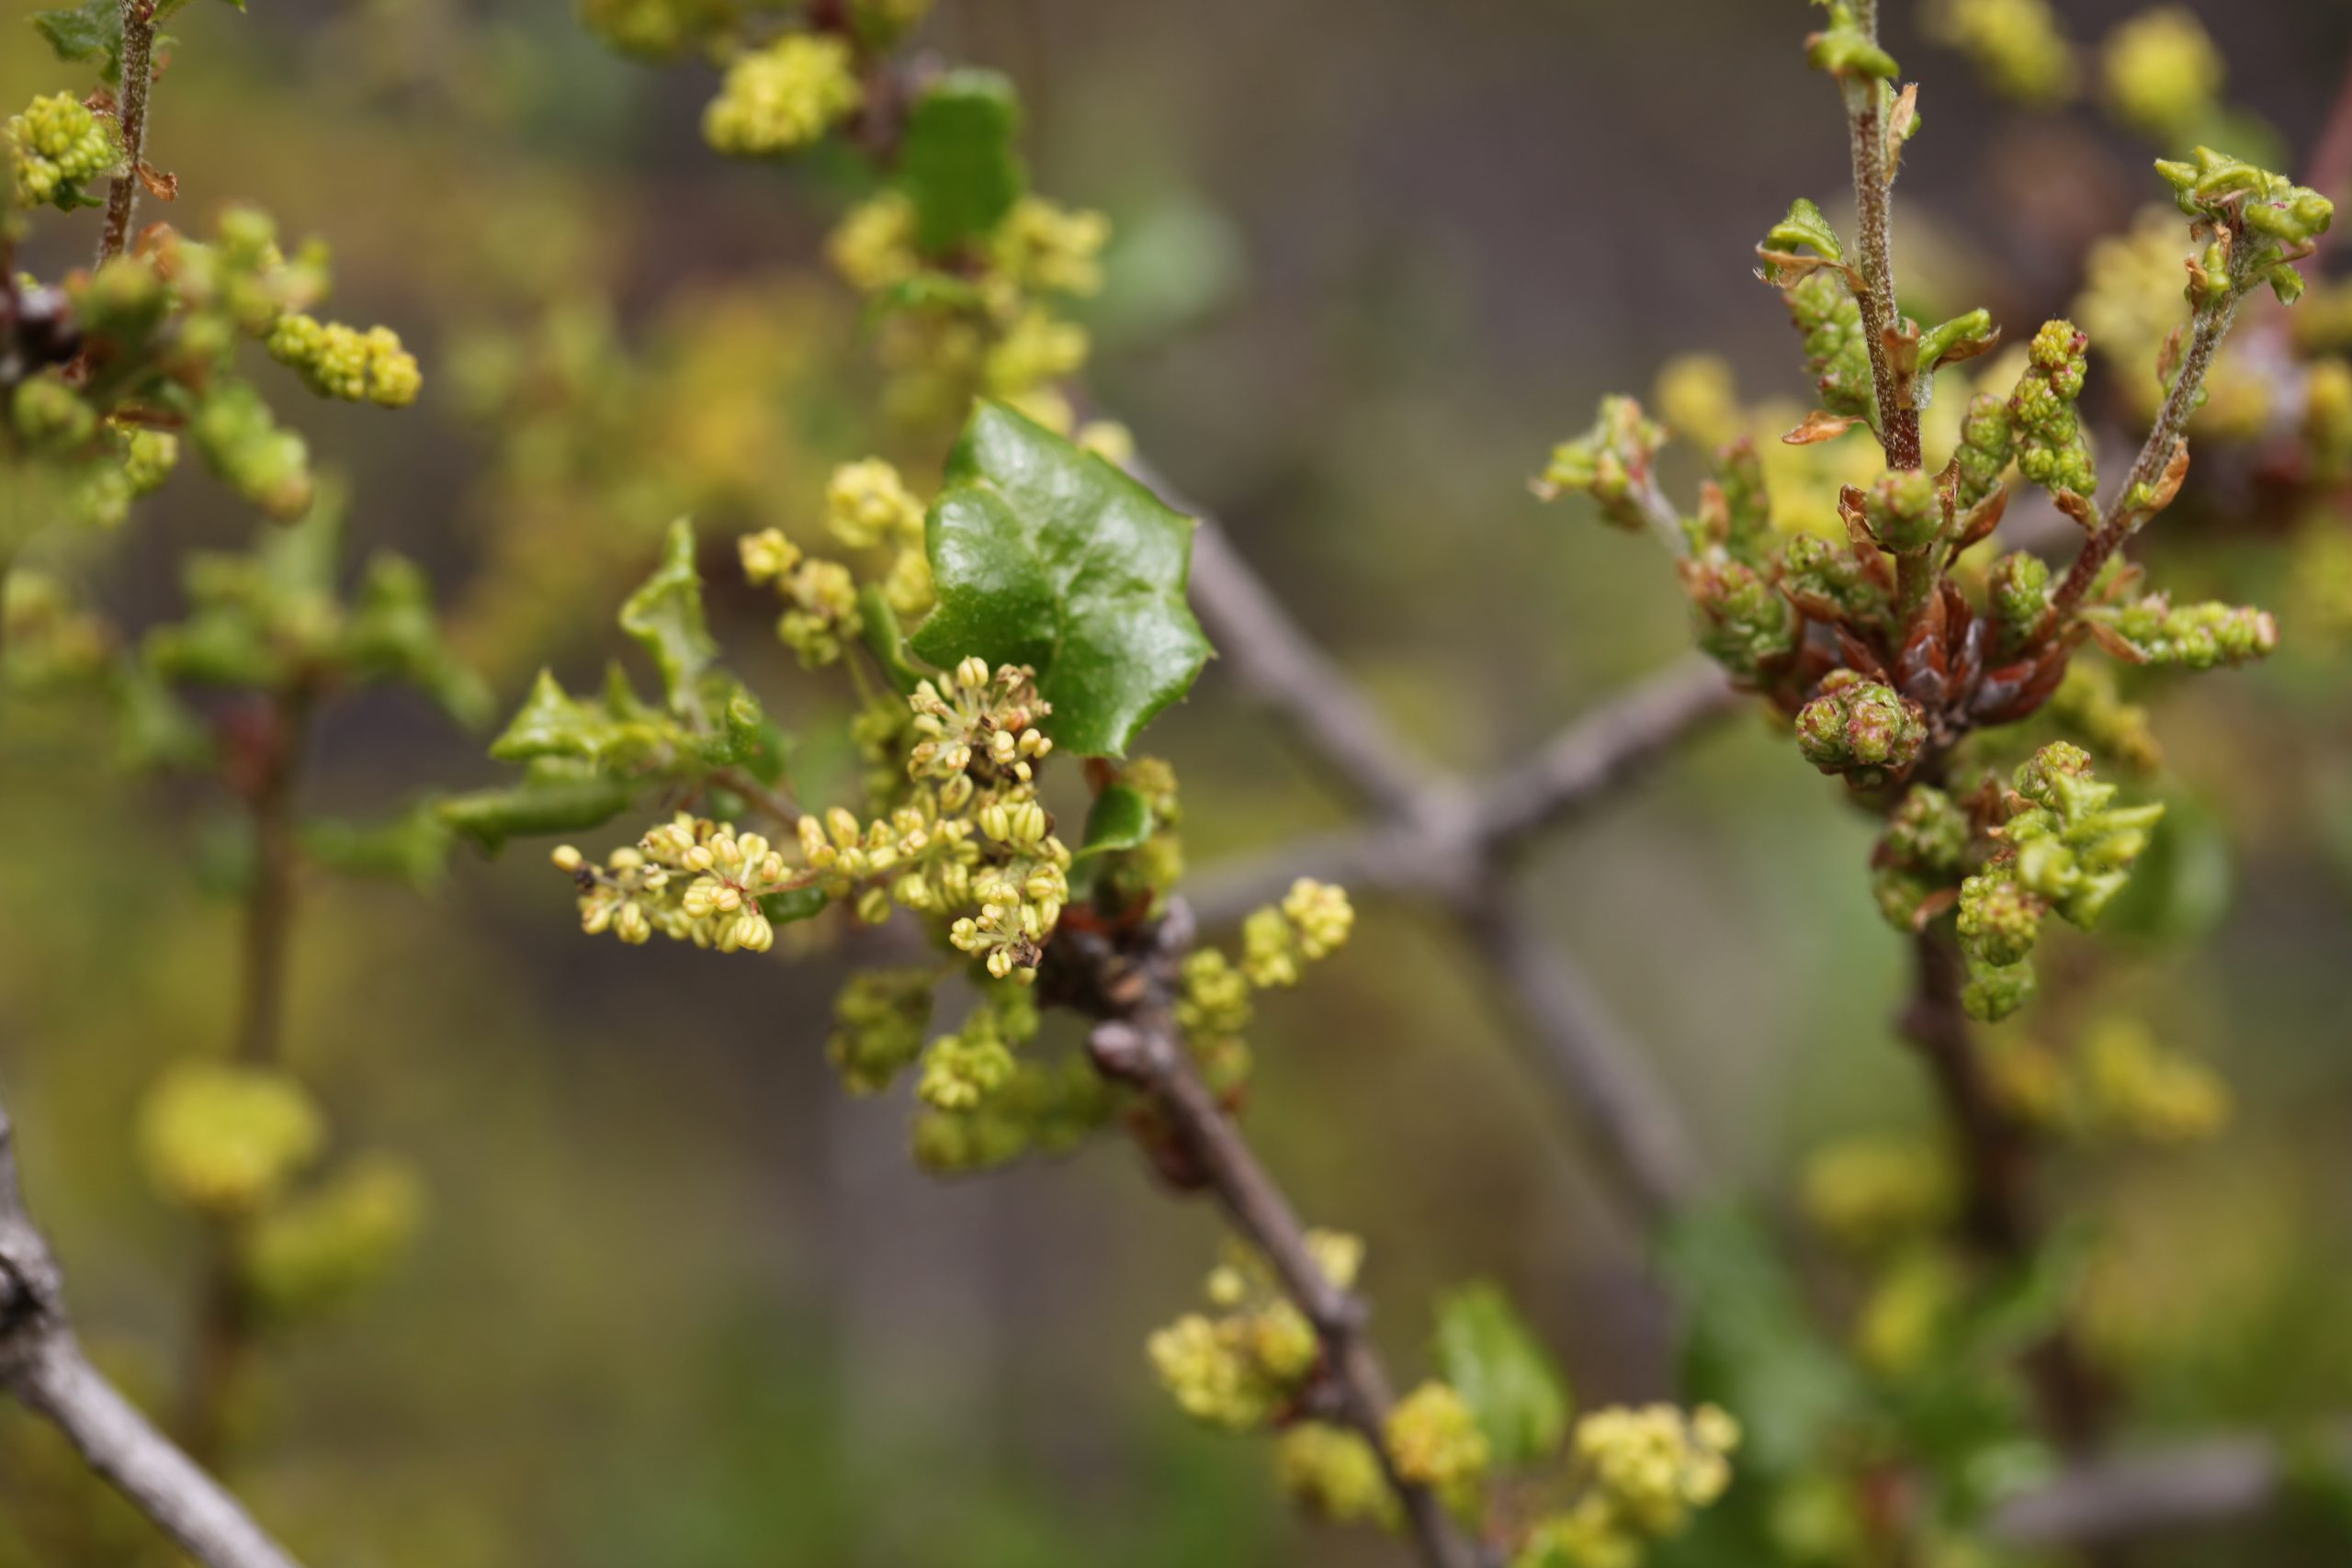 Quercus dumosa in flower. Photo by Caroline Iacuaniello